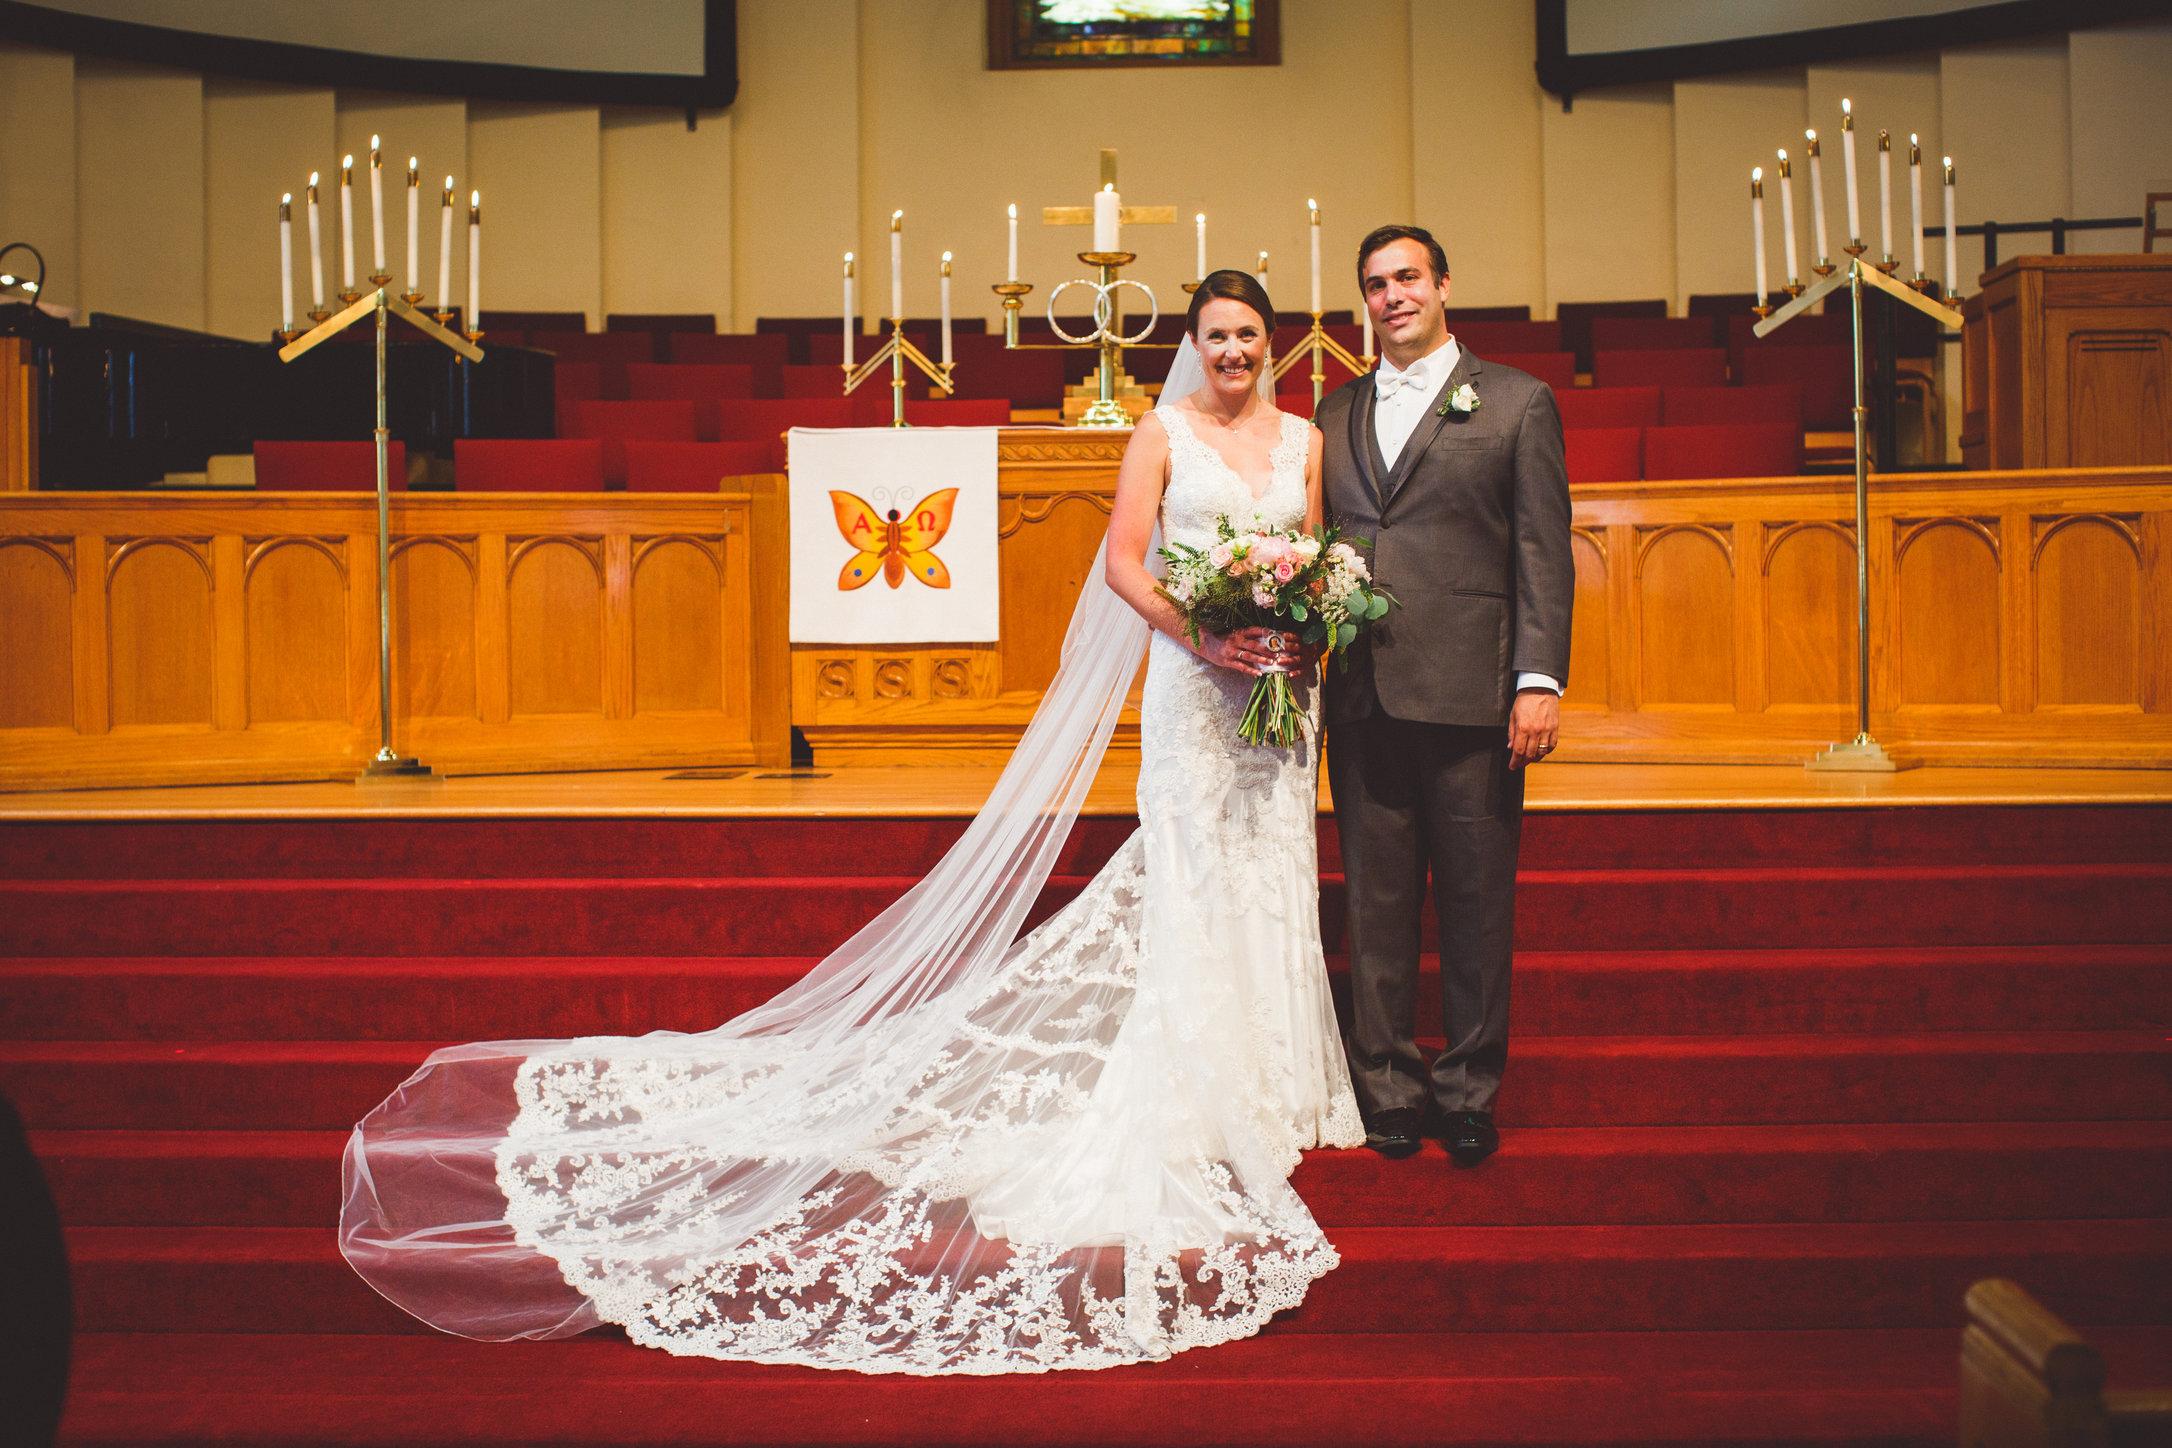 SandC-wedding-298.jpg